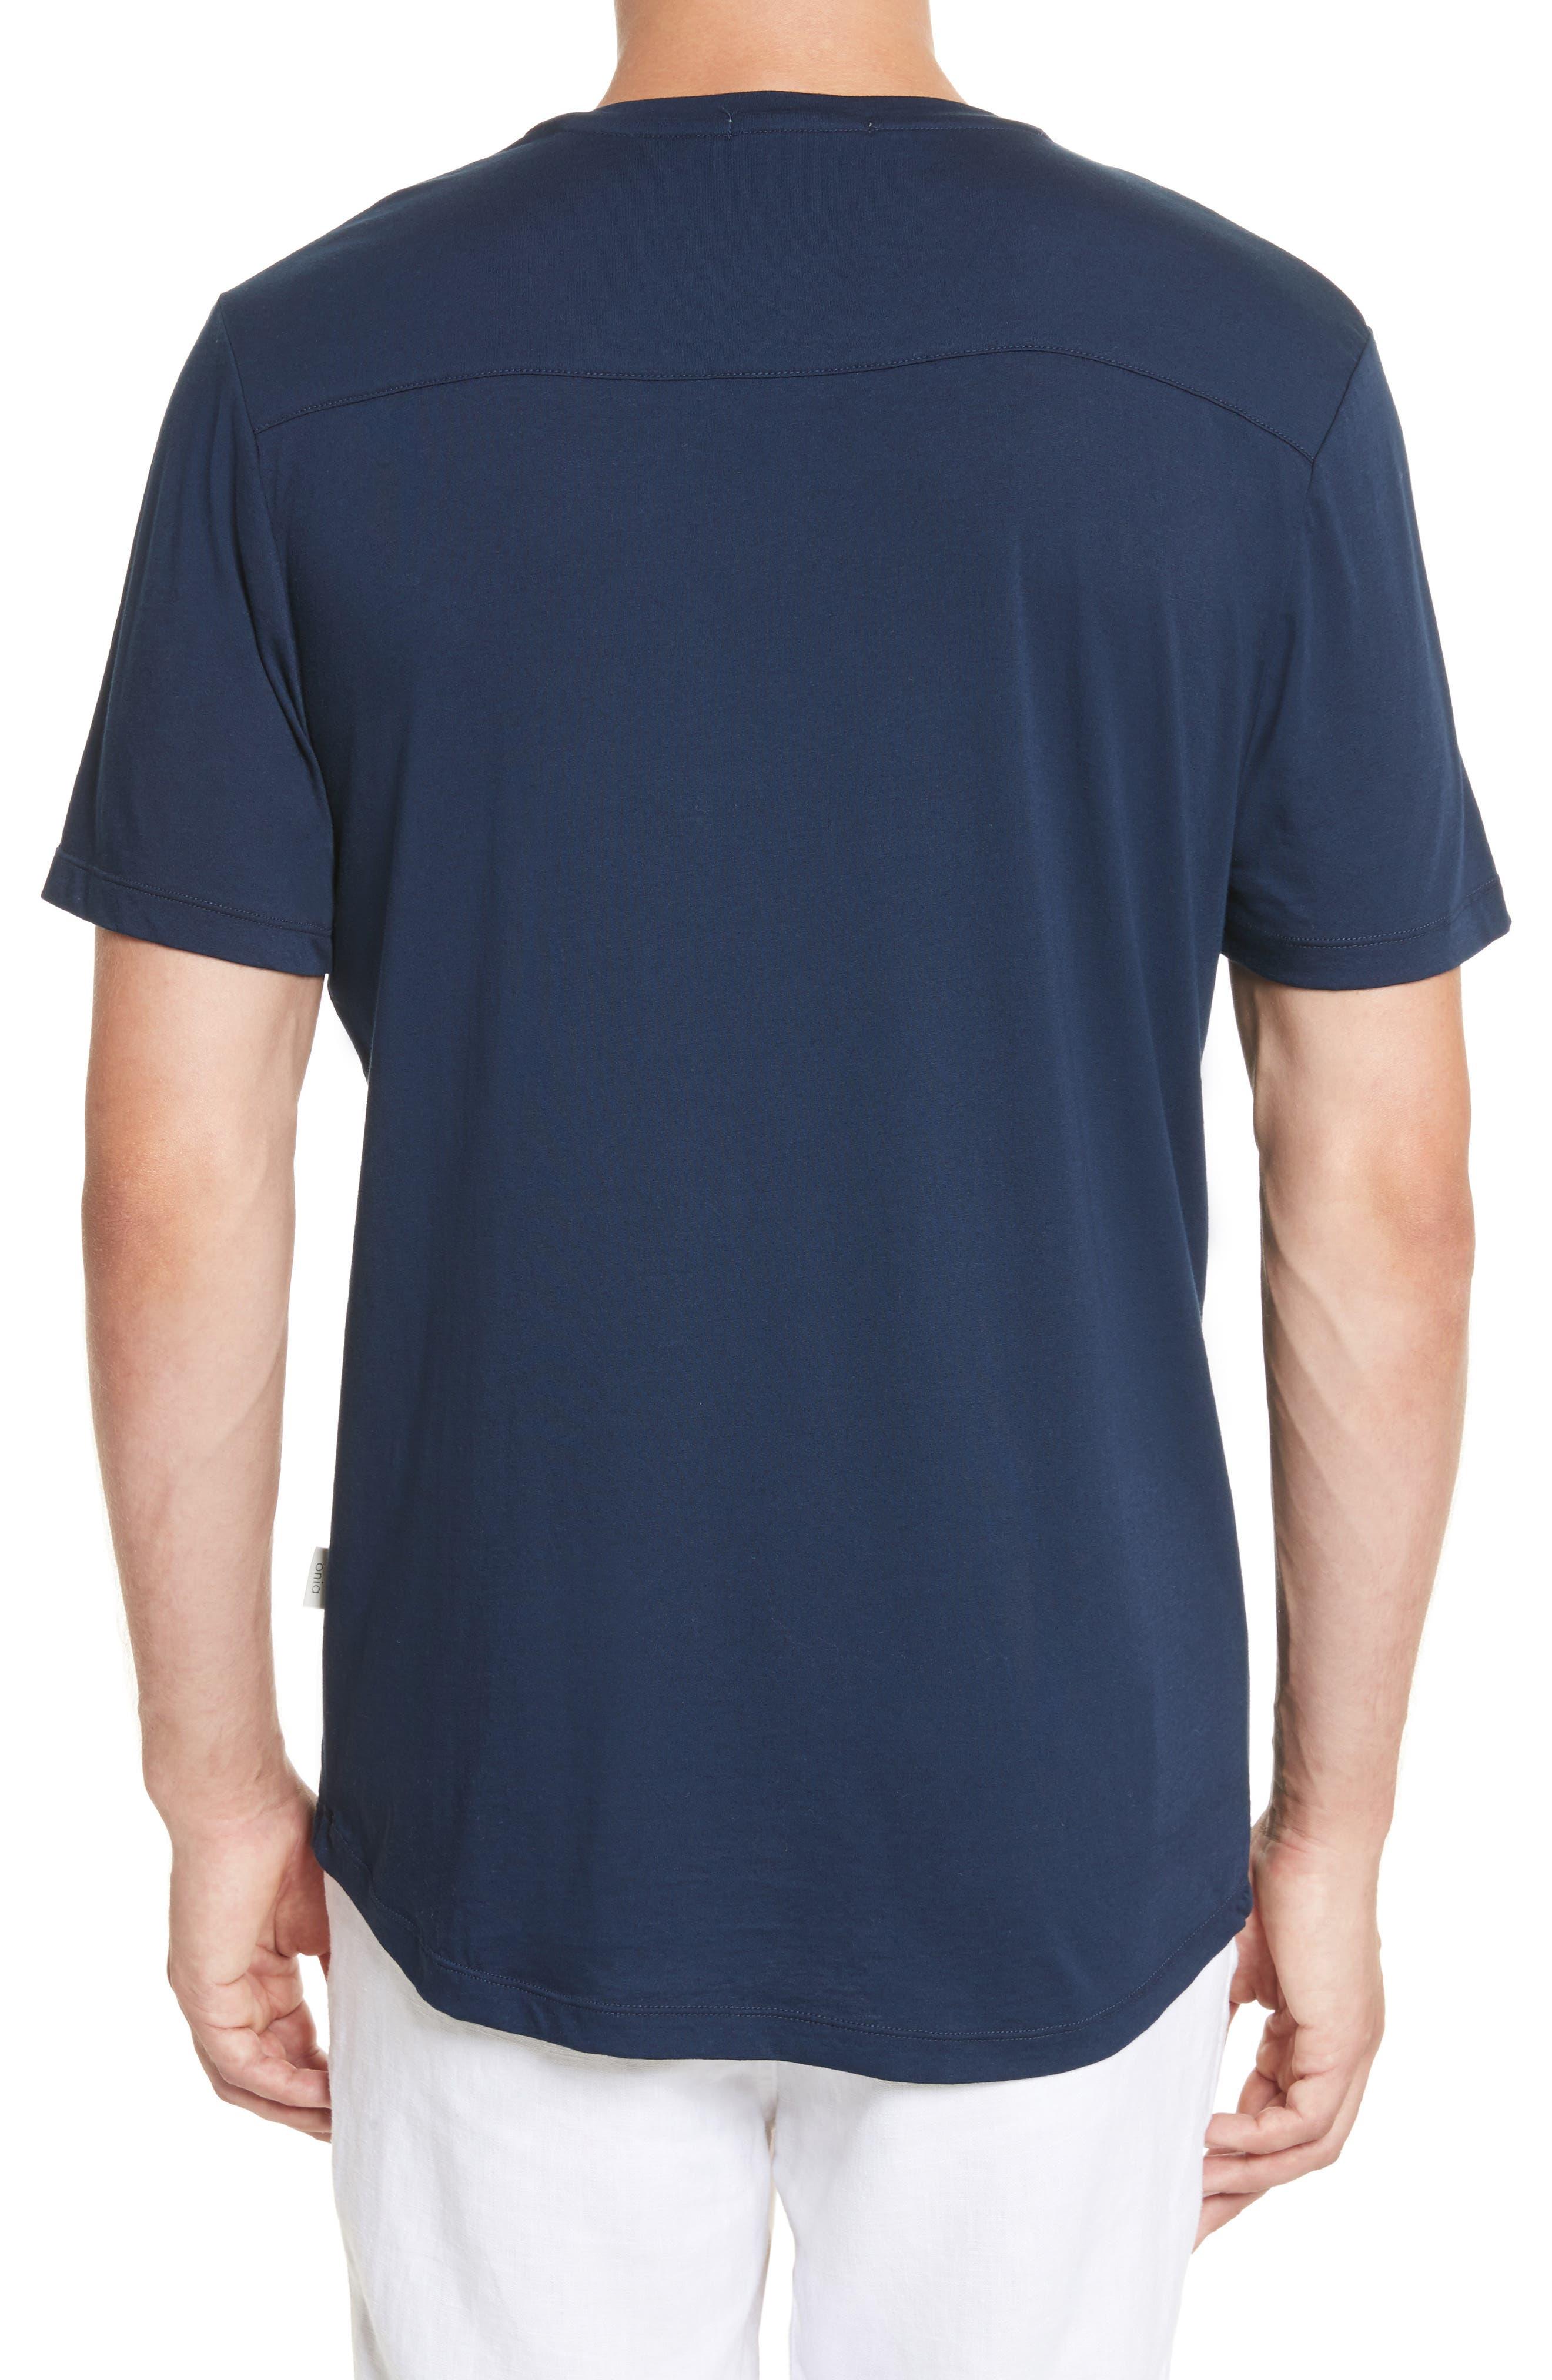 Joey V-Neck T-shirt,                             Alternate thumbnail 2, color,                             419